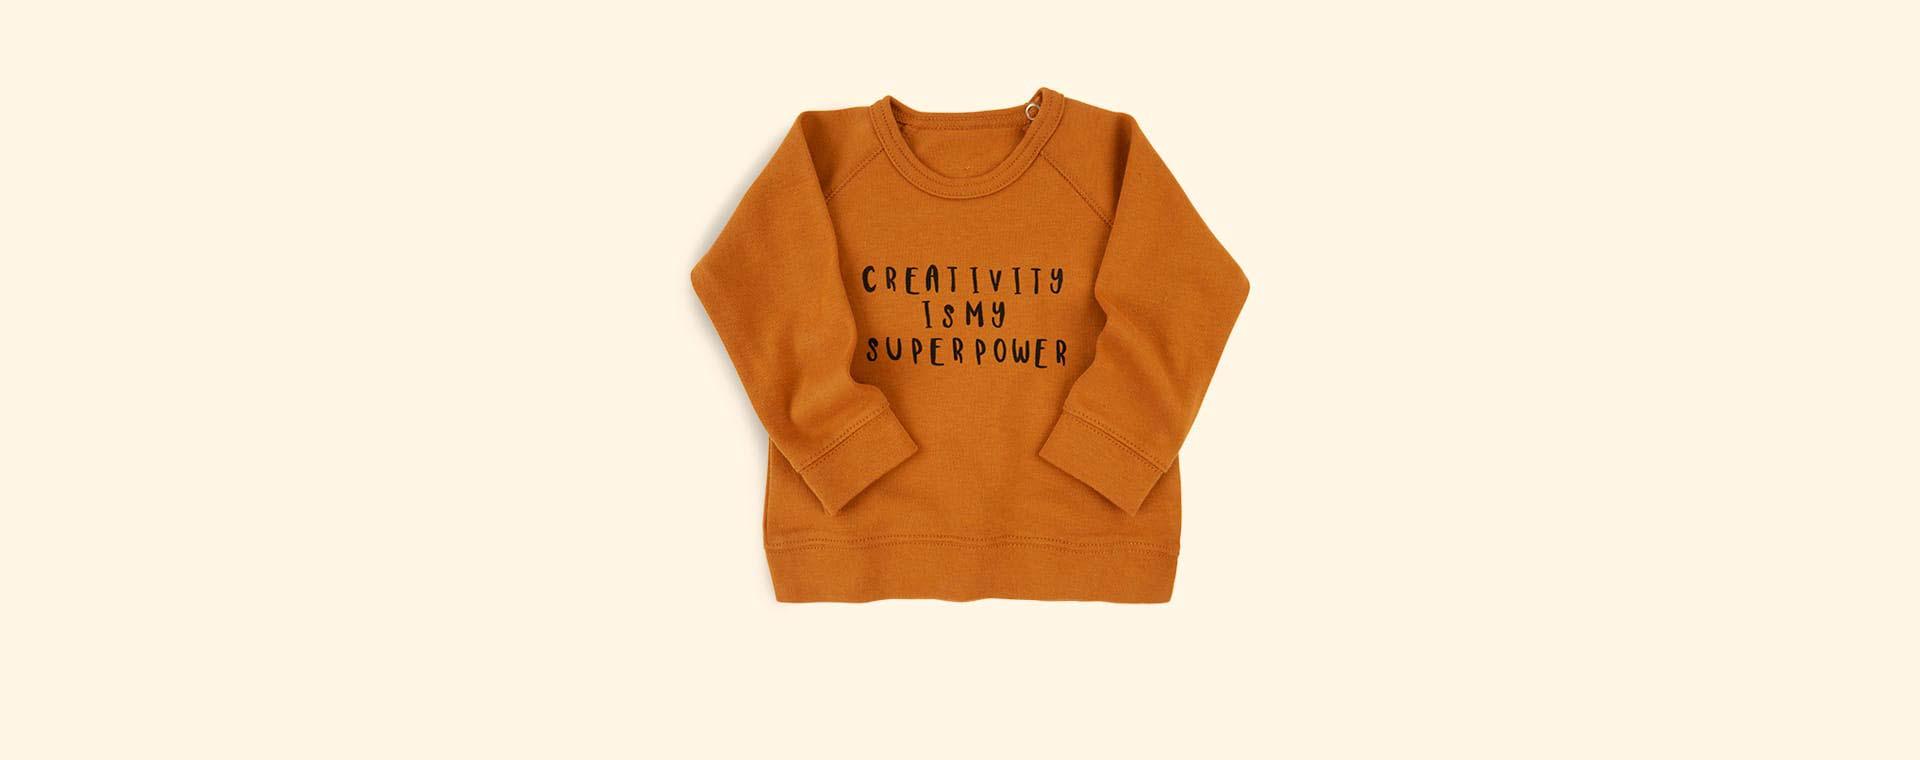 Spice Organic Zoo Creativity Sweatshirt